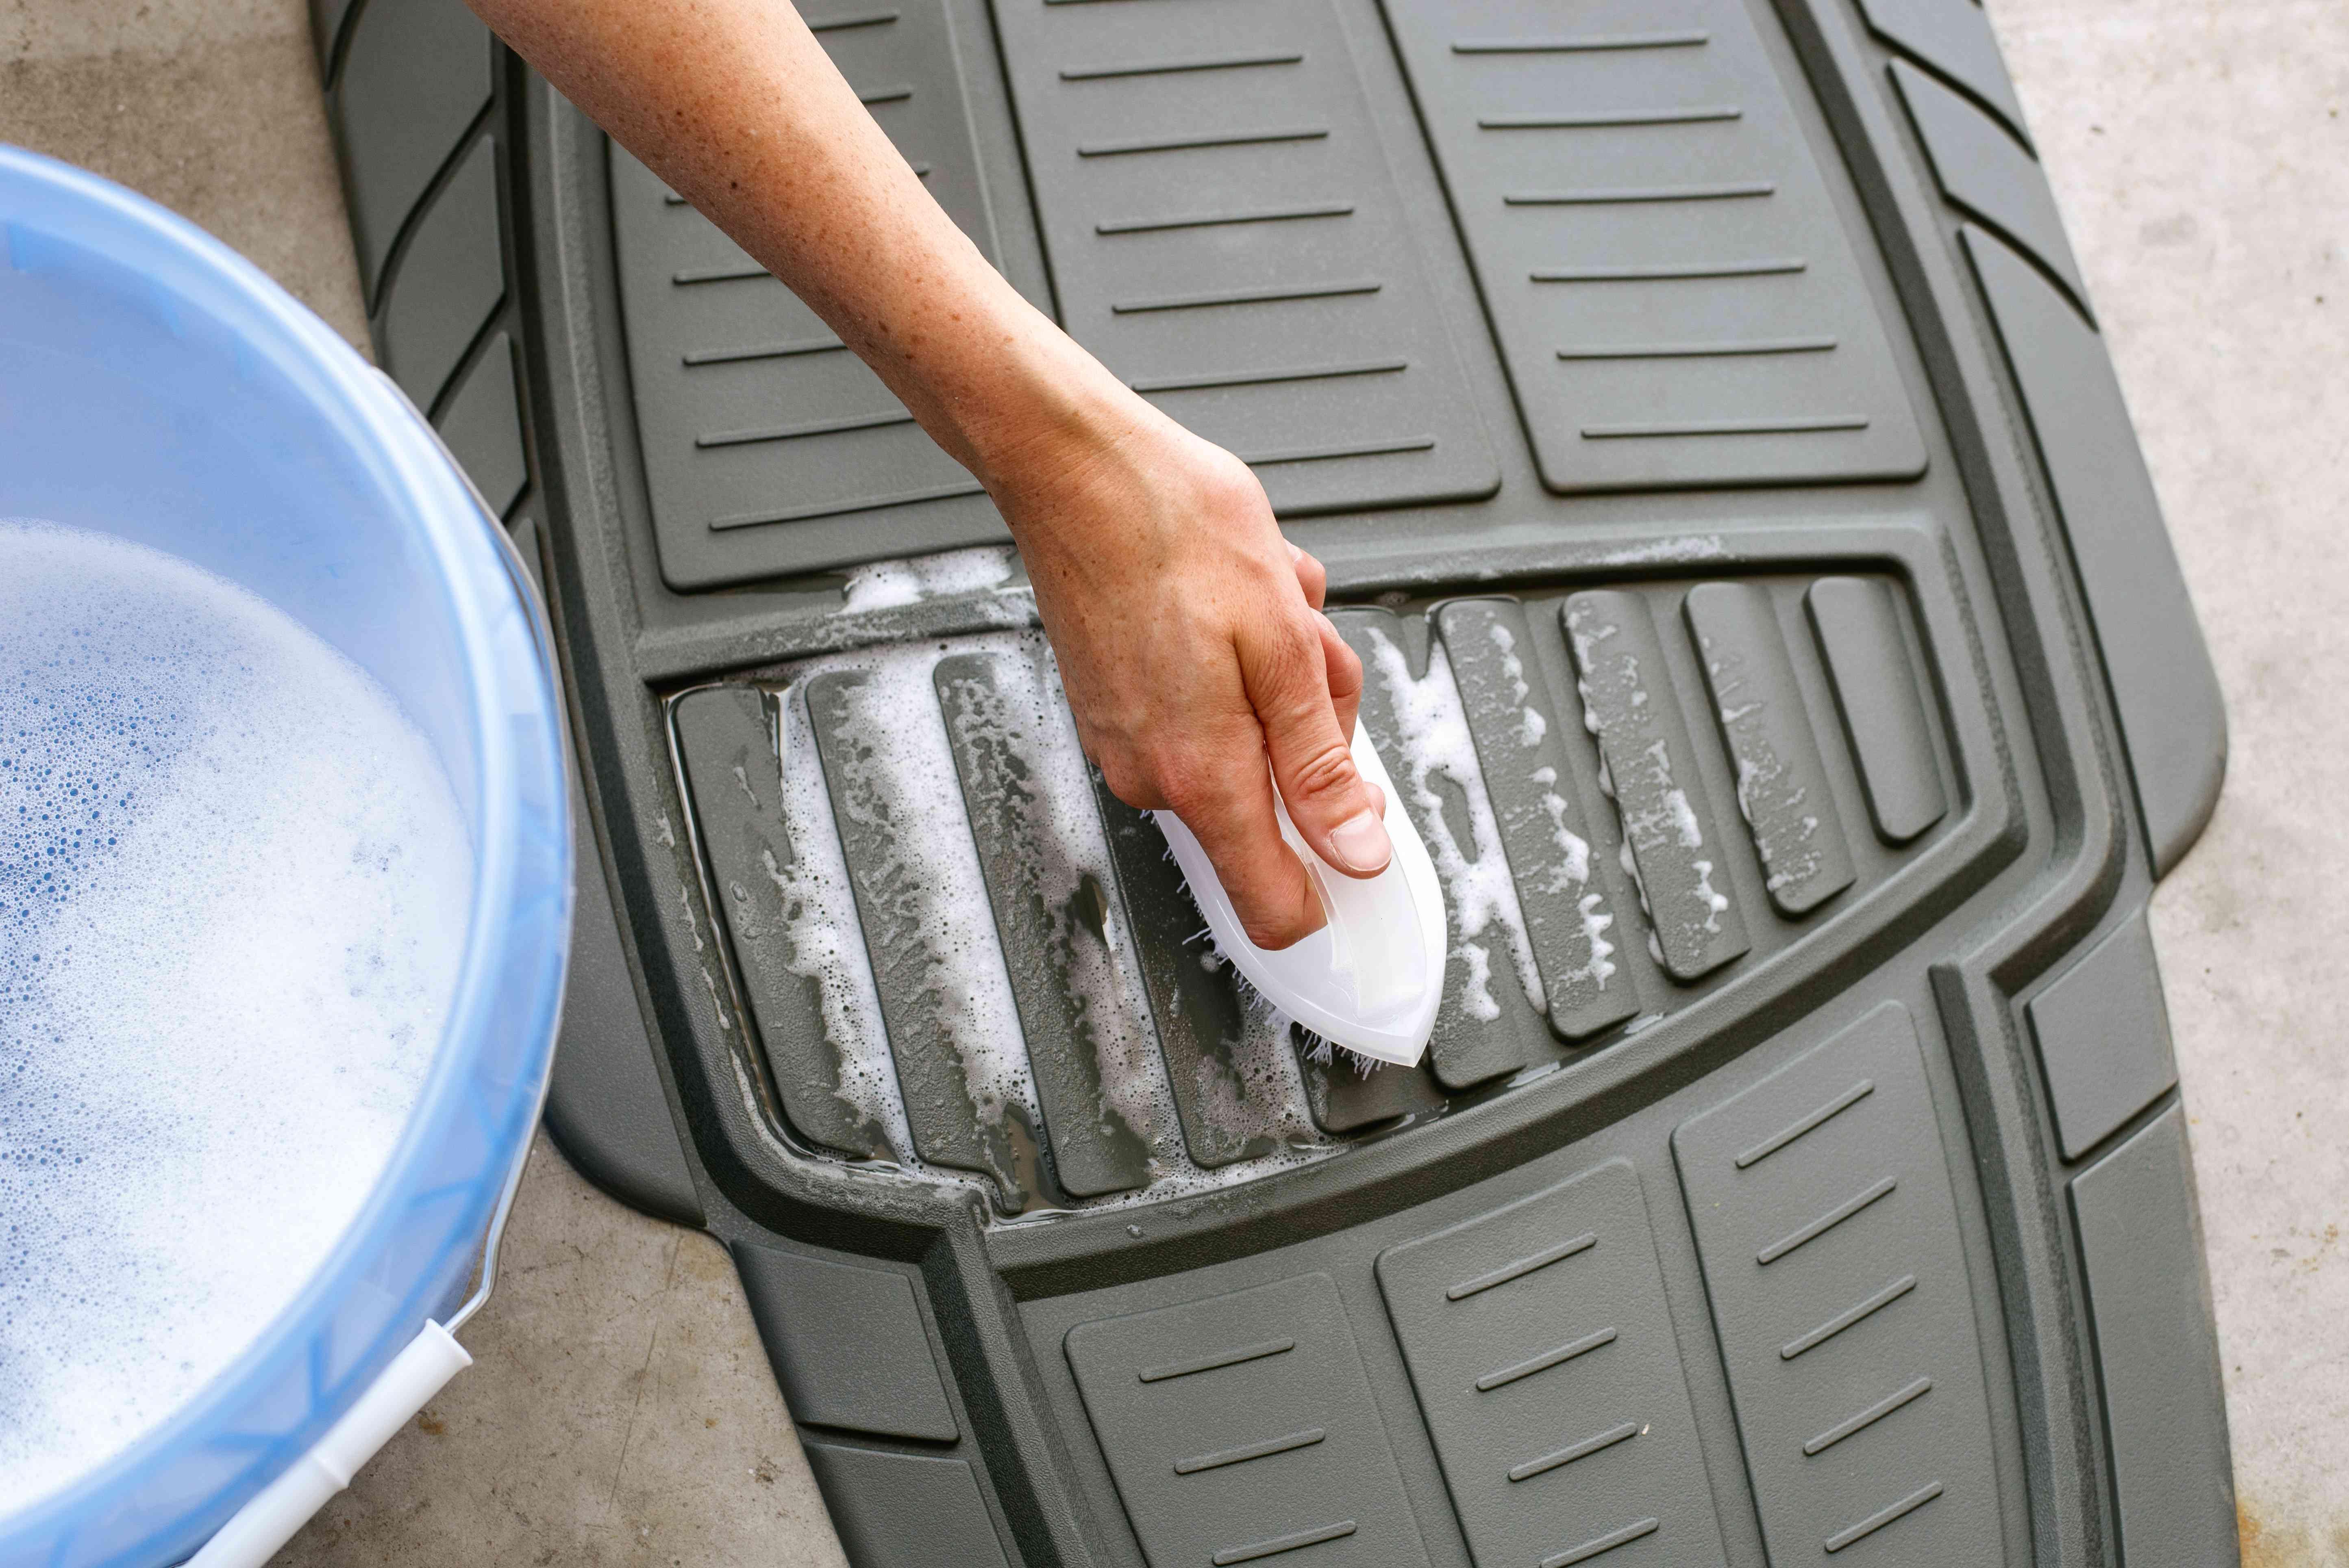 Medium-bristled brush scrubbing rubber car mat